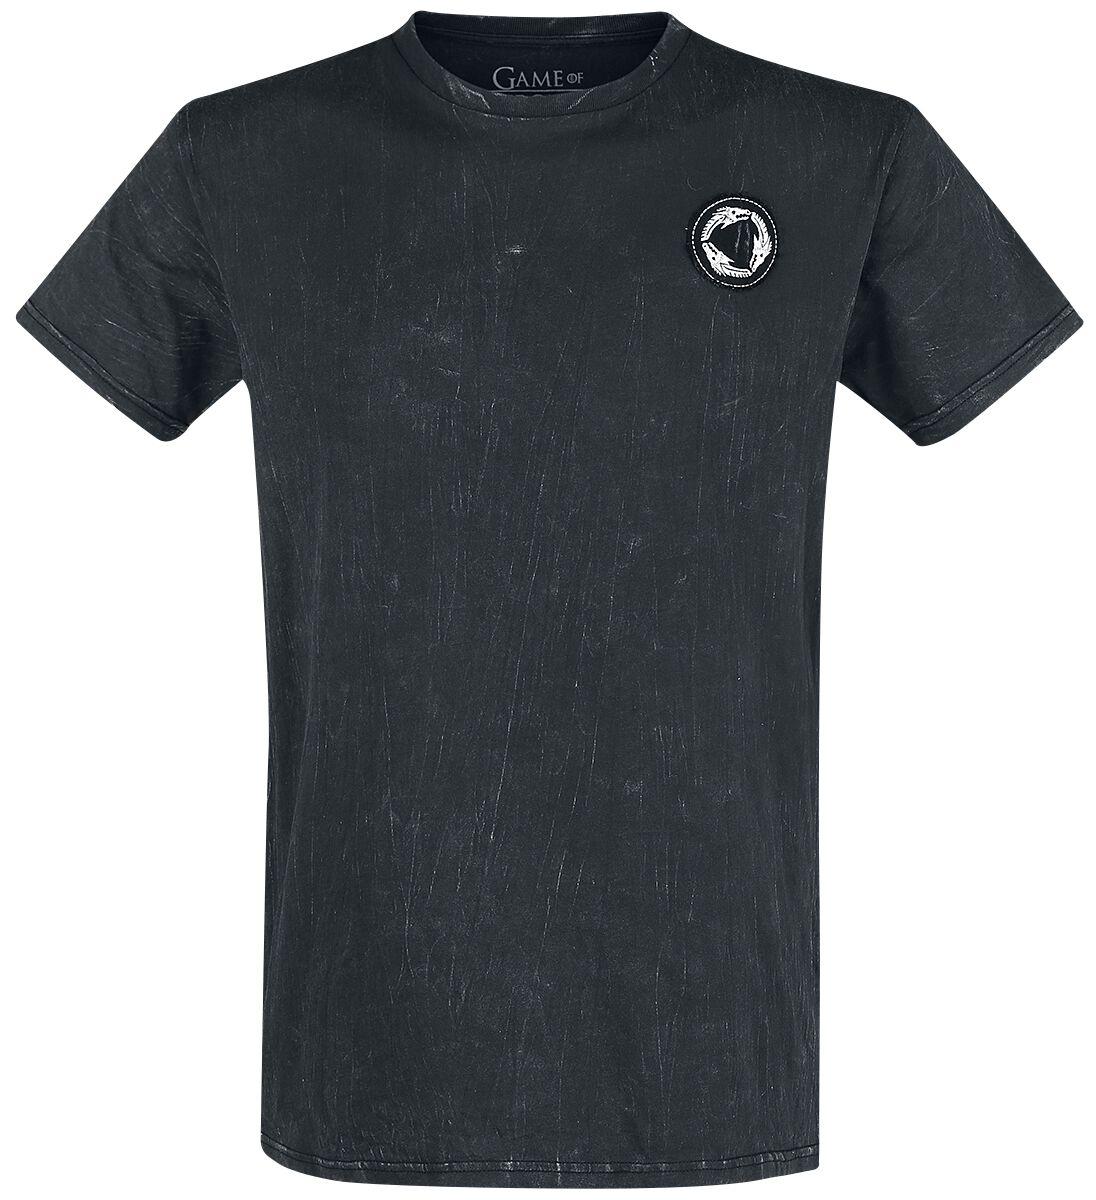 Image of   Game Of Thrones Valyrio T-Shirt mørk grå